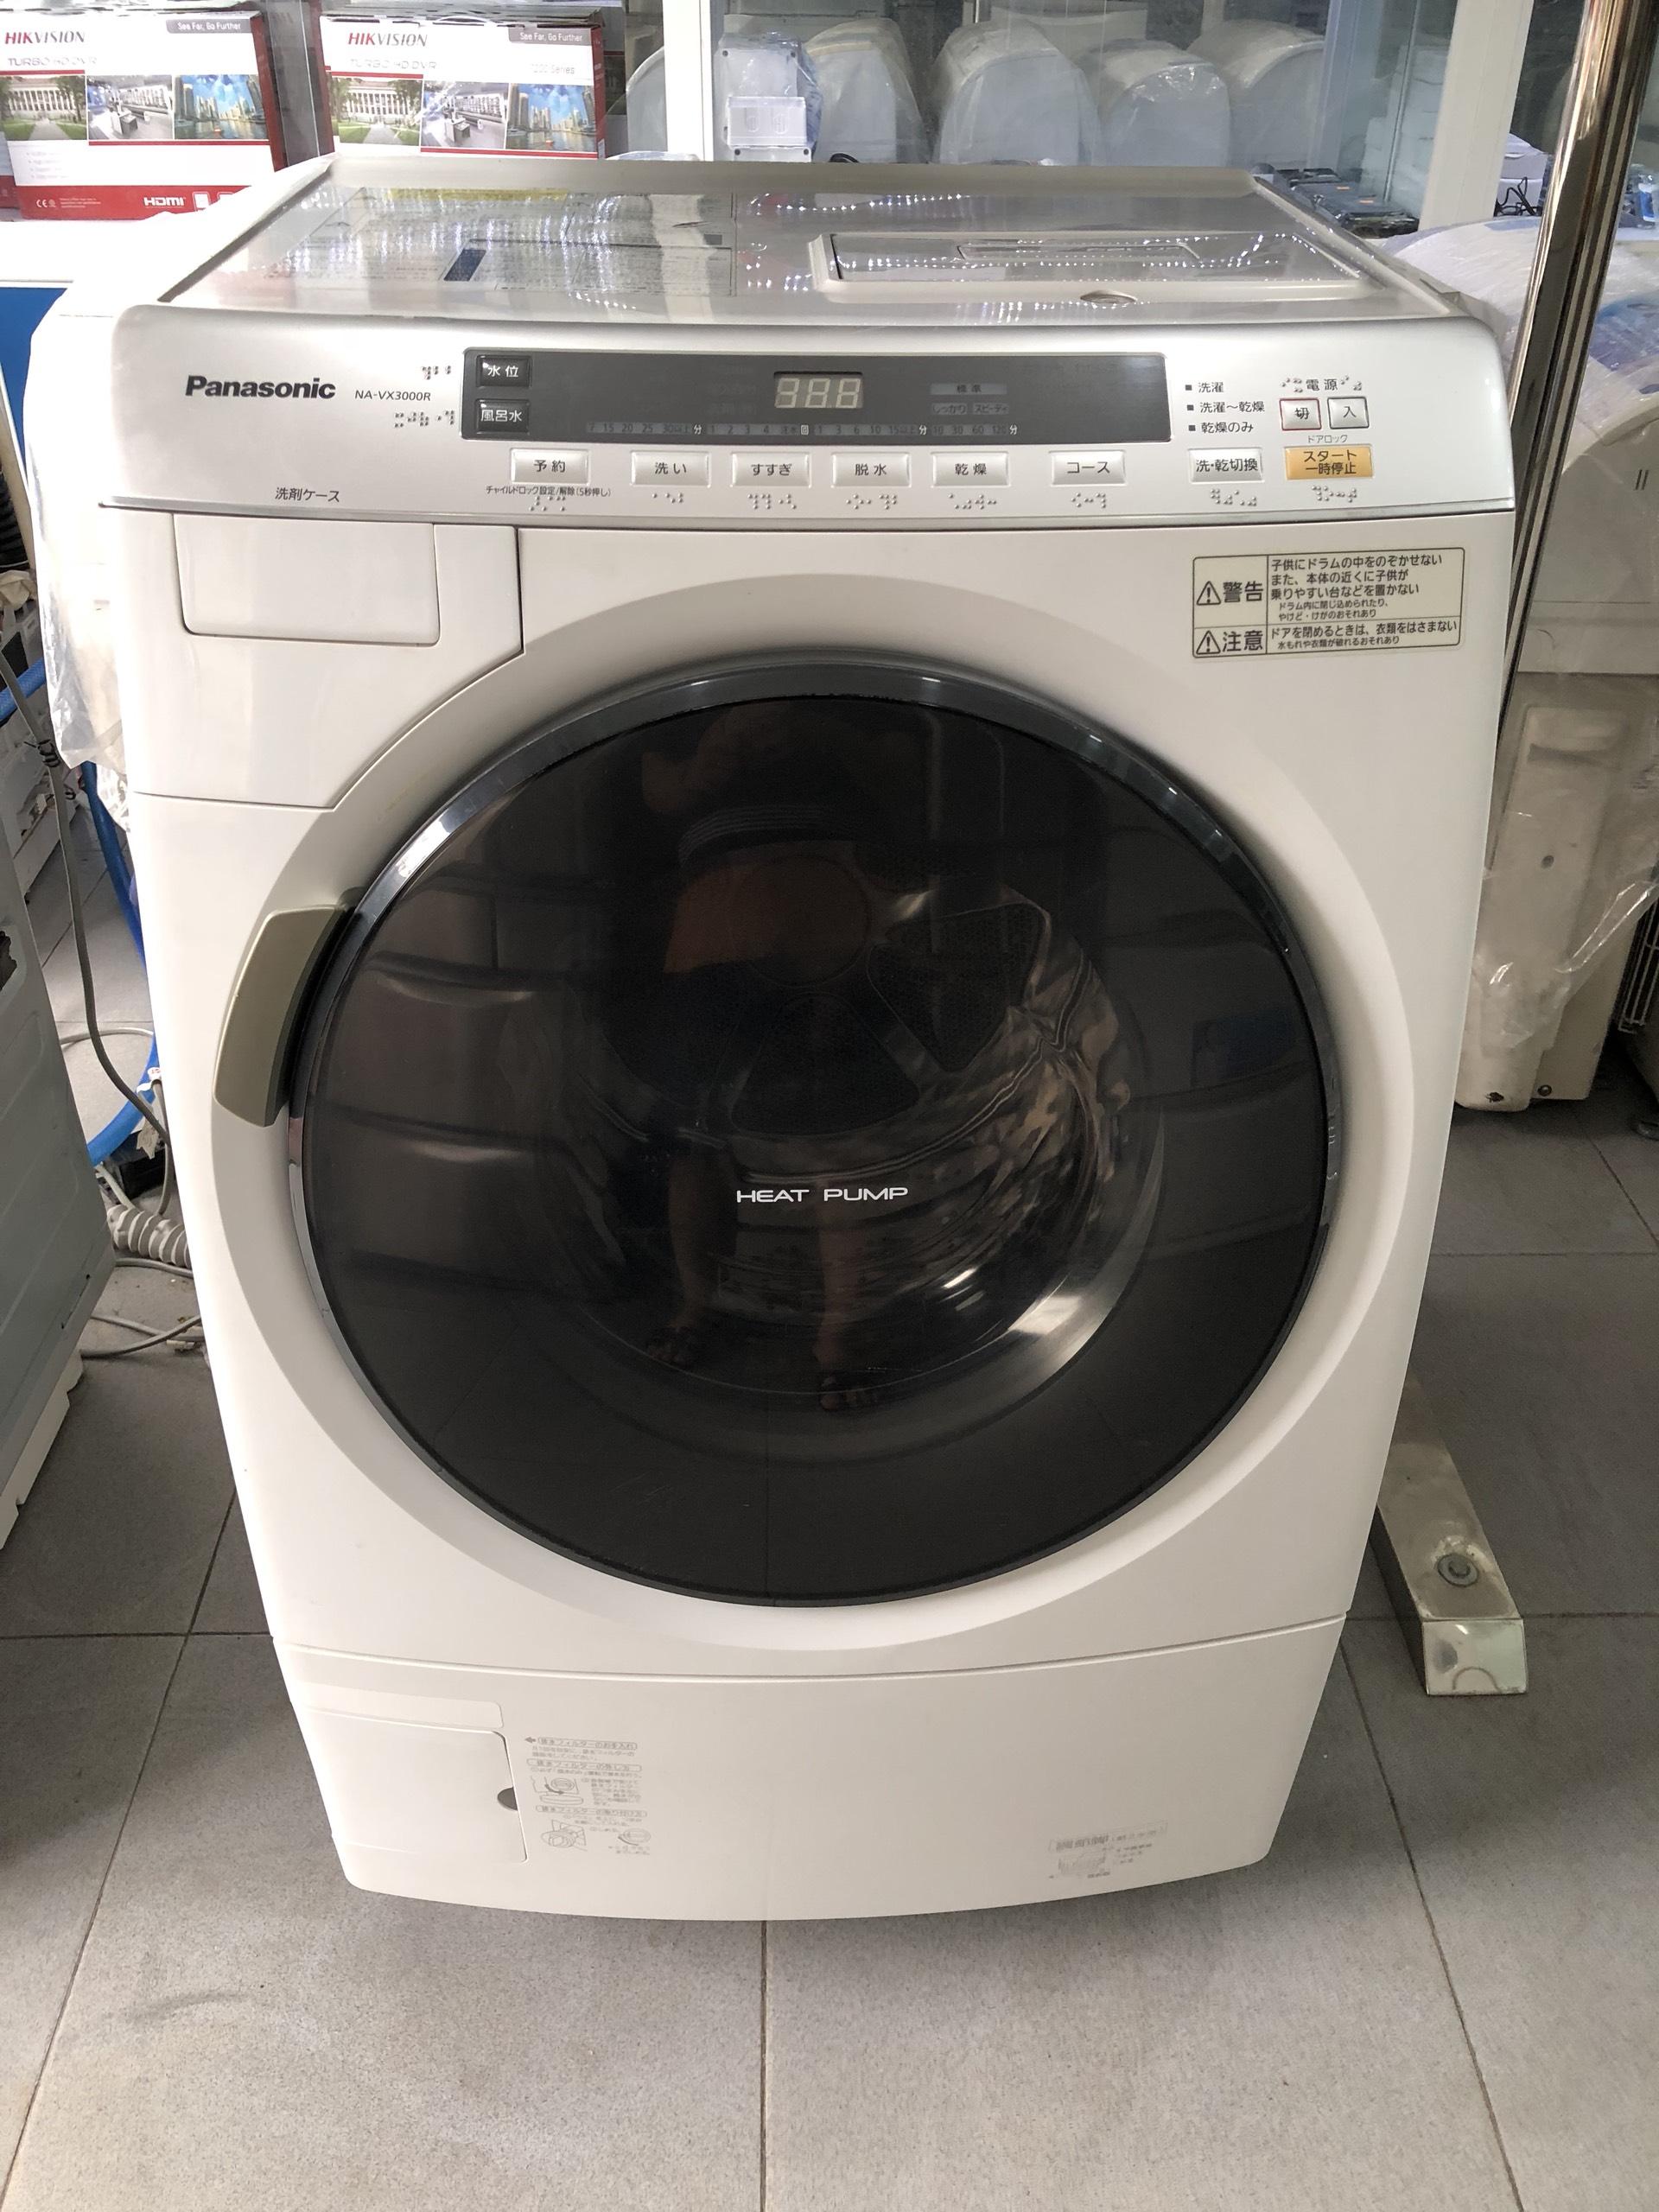 MÁY GIẶT PANASONIC NA-VX3000R